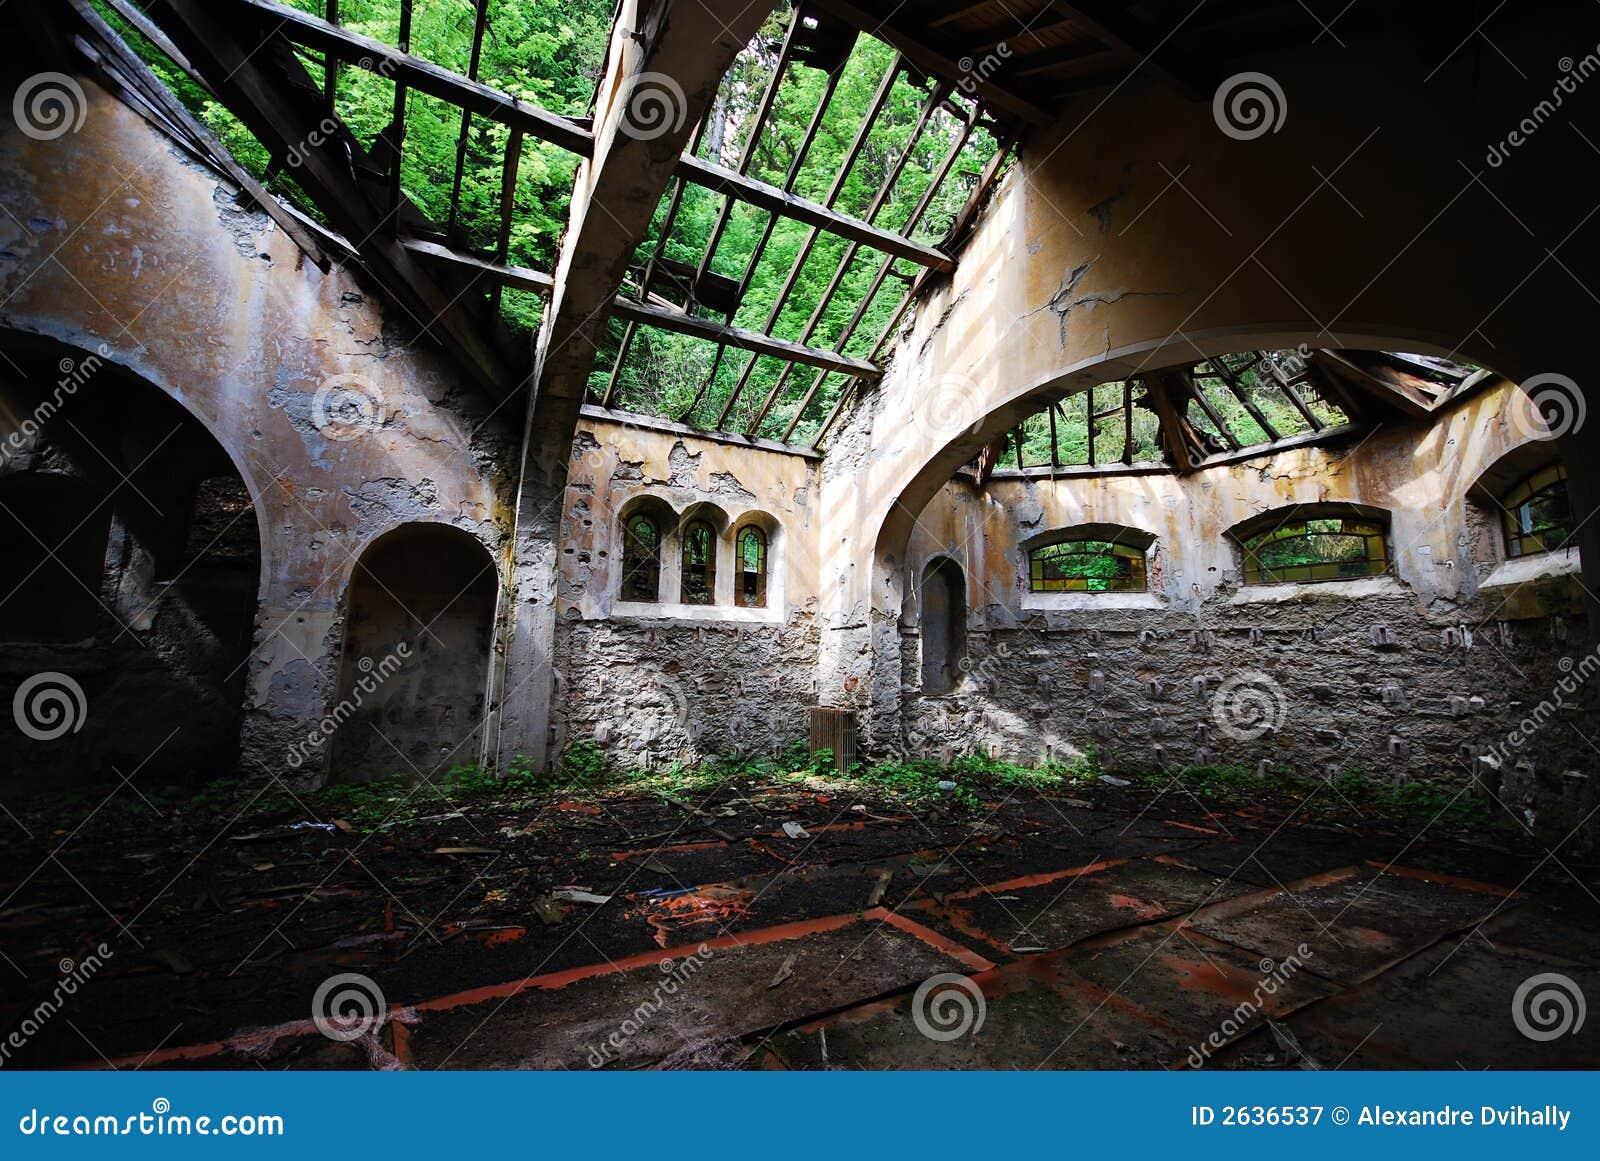 Abandoned Church Royalty Free Stock Photography Image